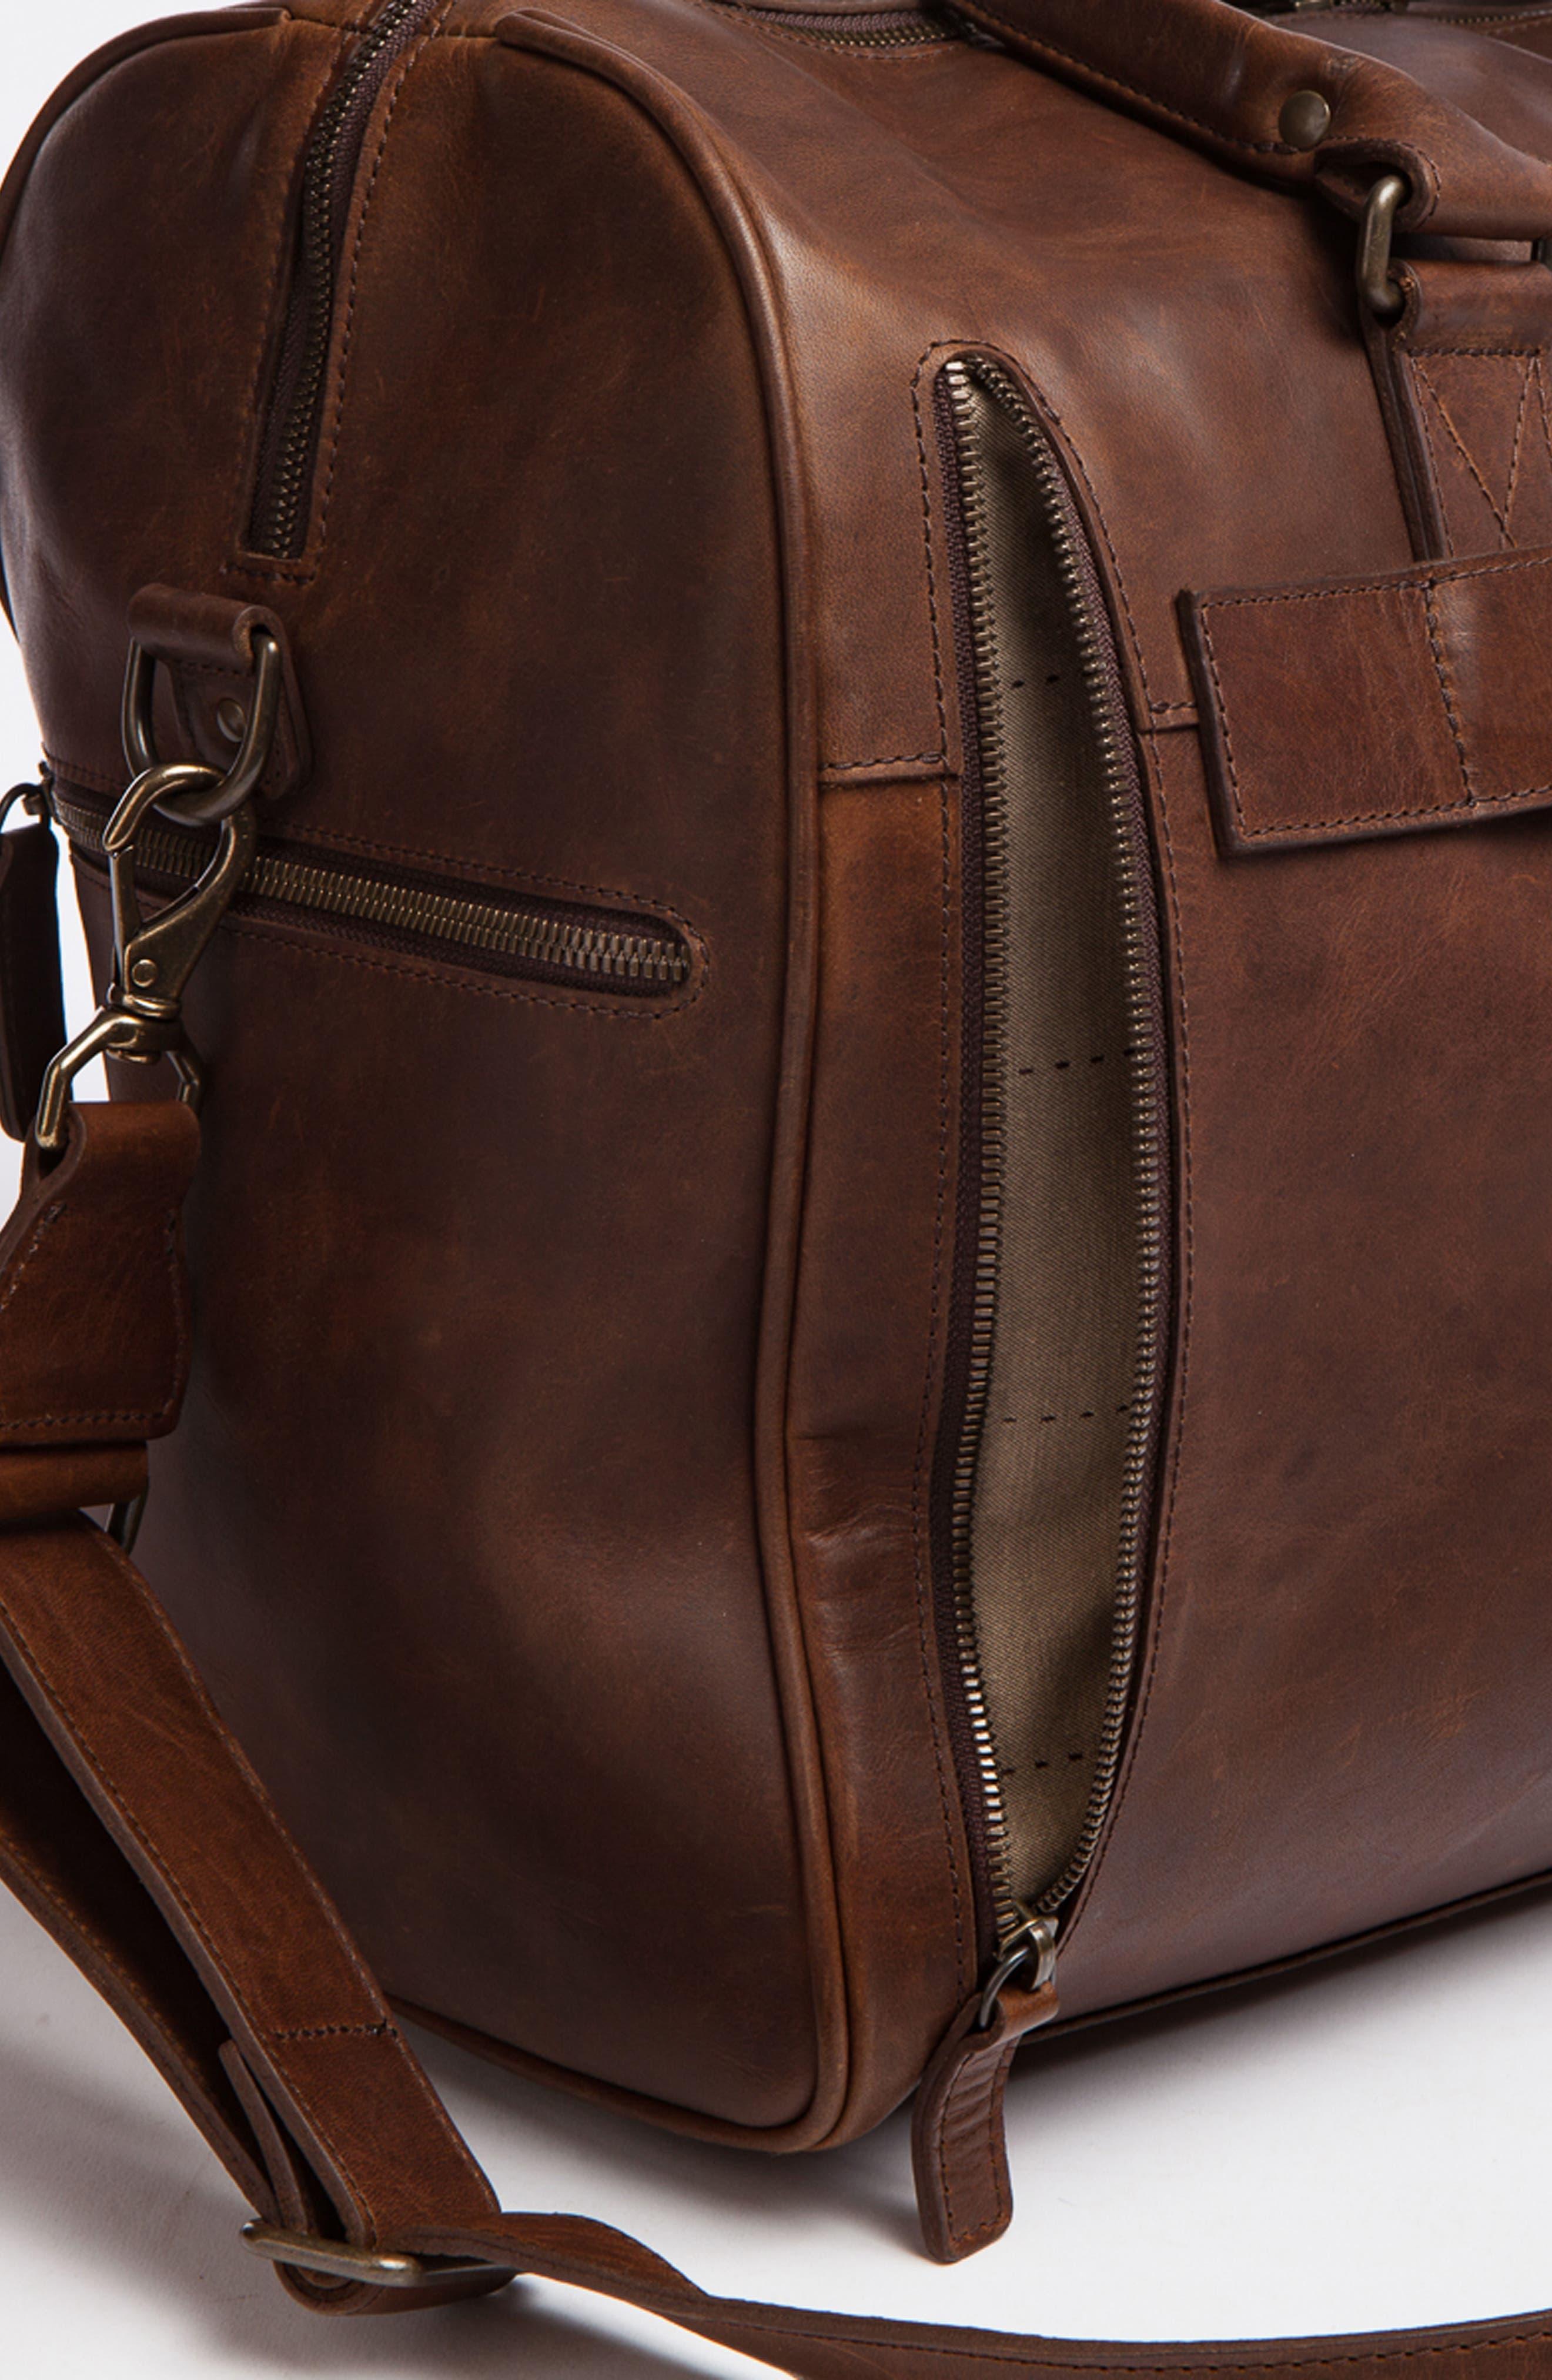 Booker Leather Duffel Bag,                             Alternate thumbnail 6, color,                             BALDWIN OAK